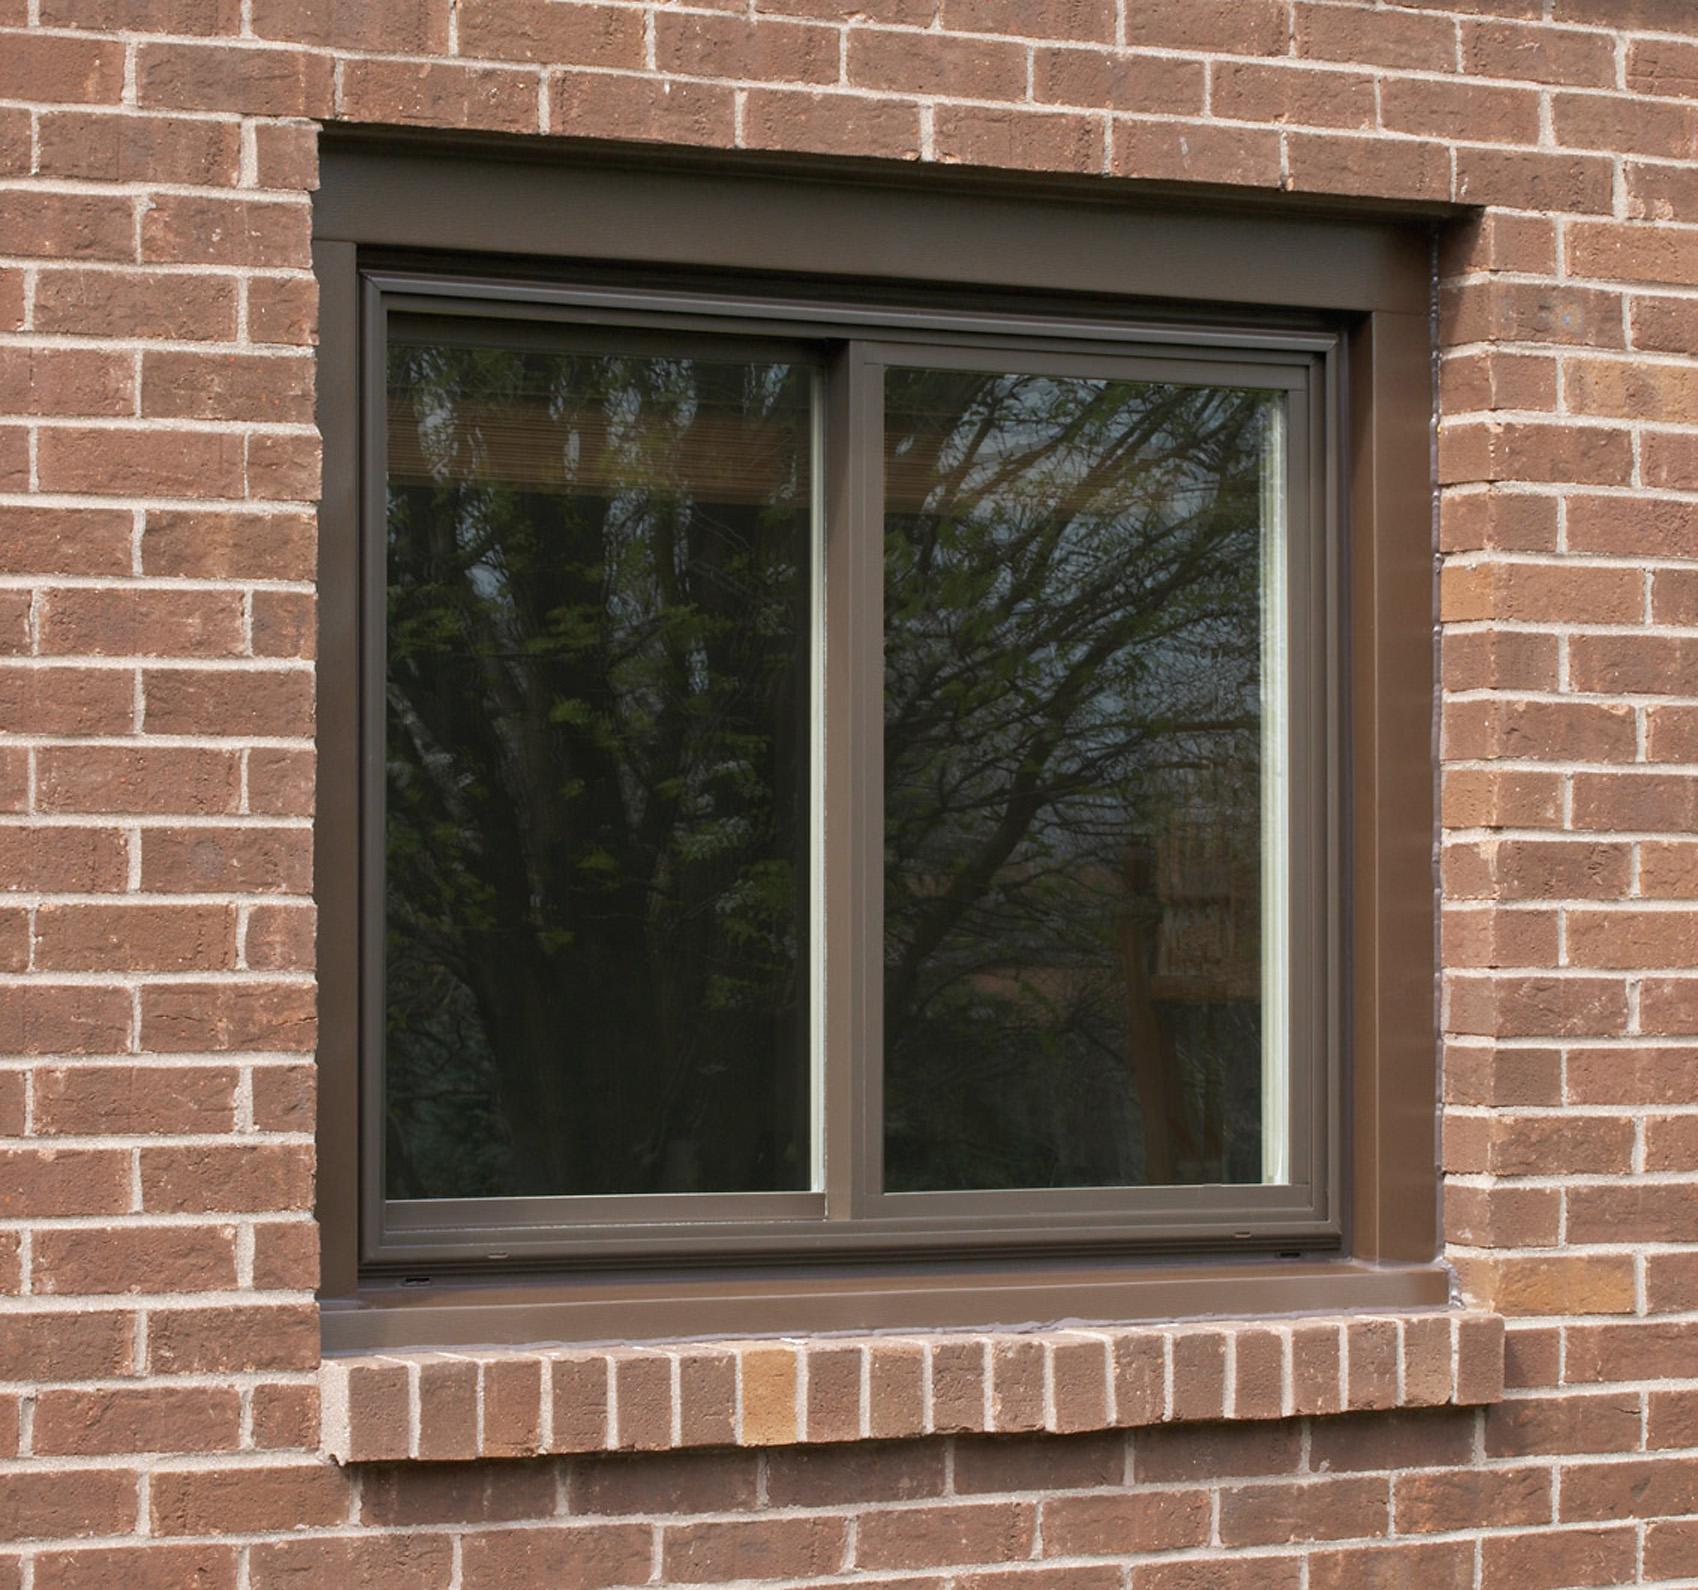 Hmi windows hmi windows vinyl replacement new construction for Vinyl sliding windows